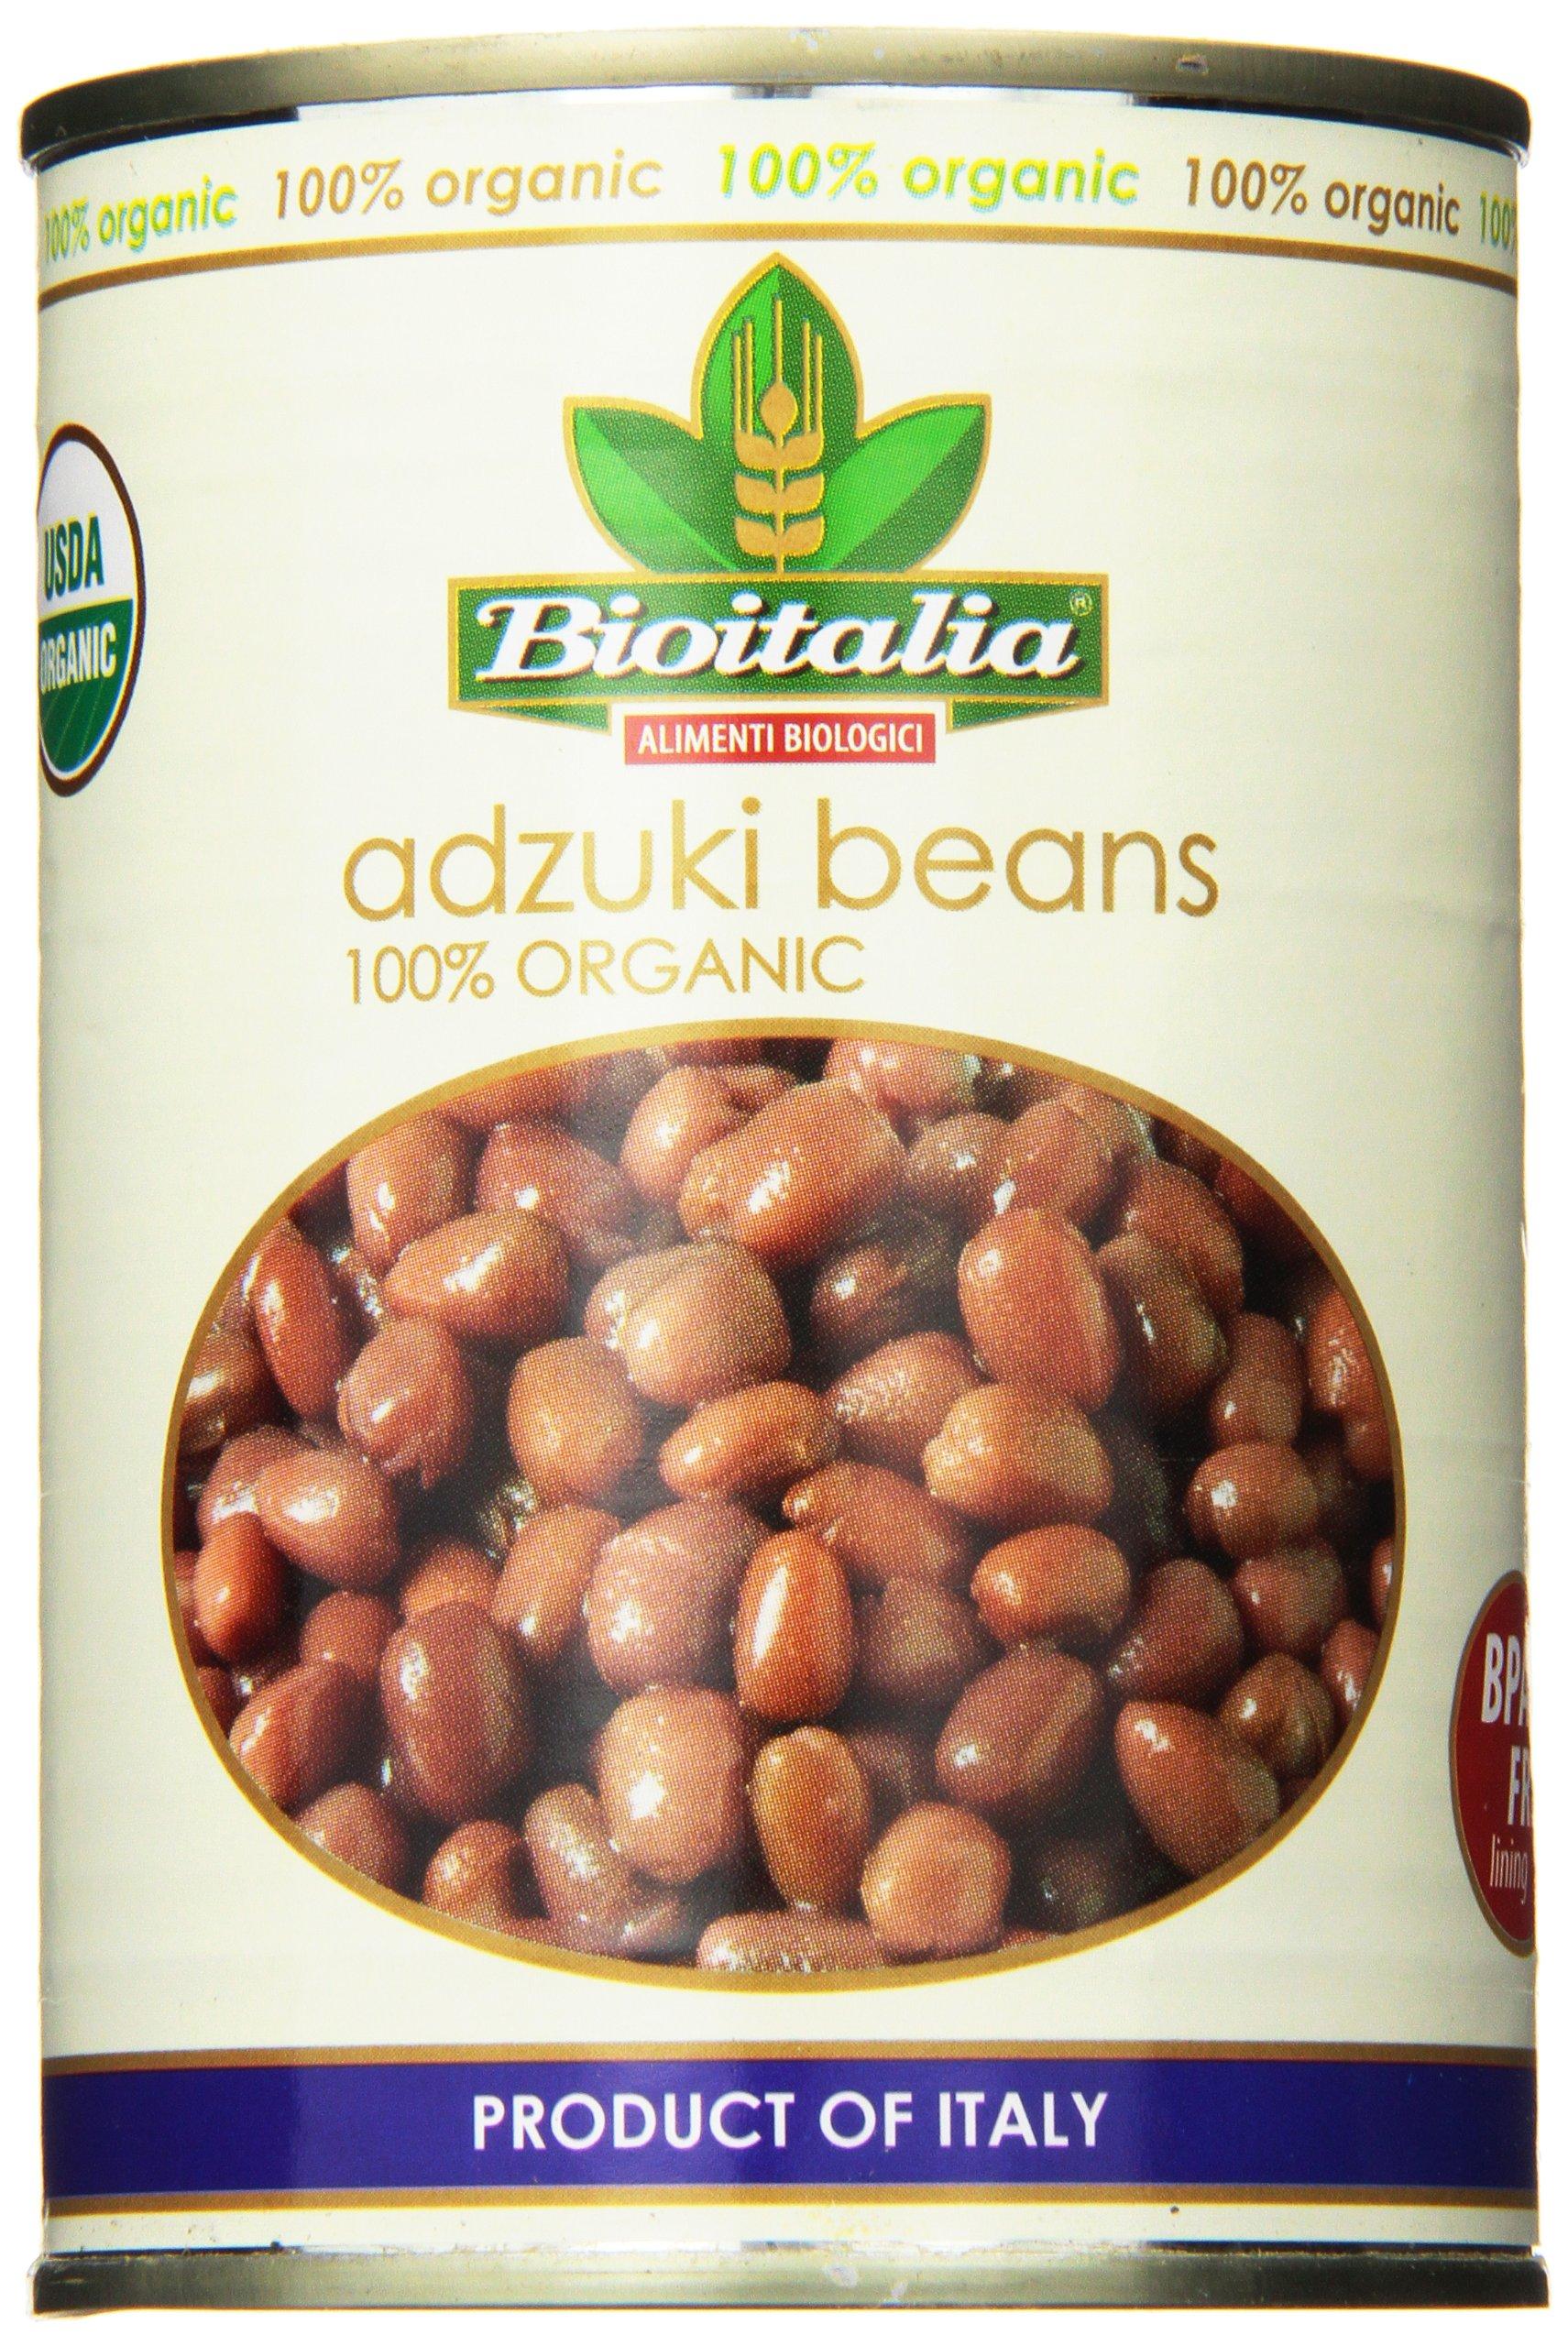 Bioitalia Azuki Beans, 14 Ounce (Pack of 12)